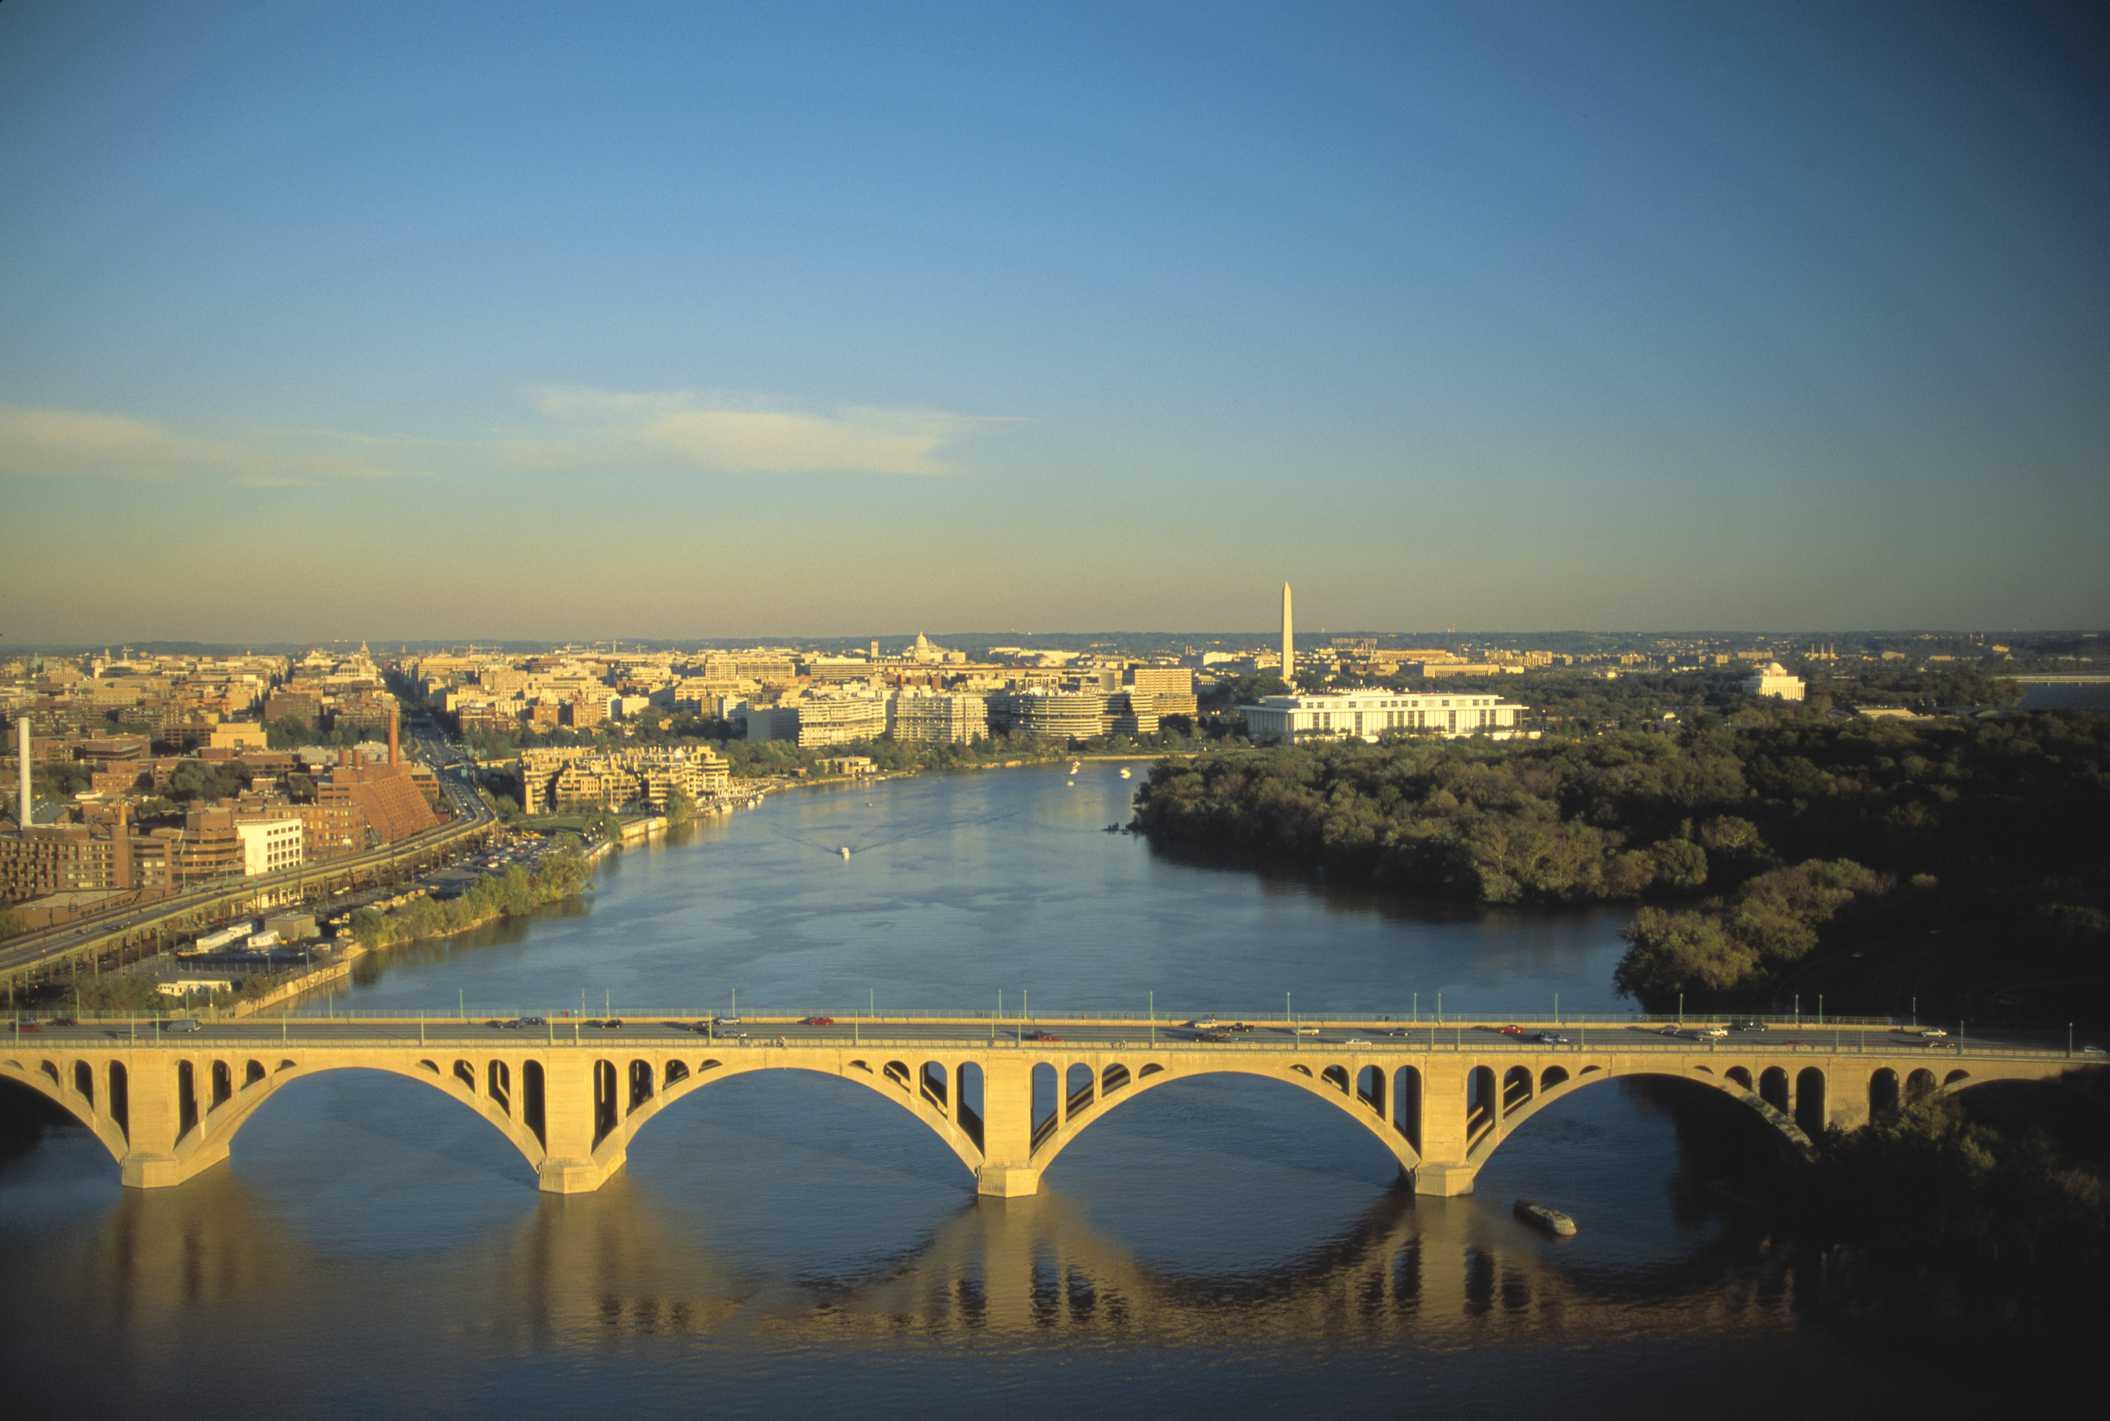 Key Bridge Over the Potomac River